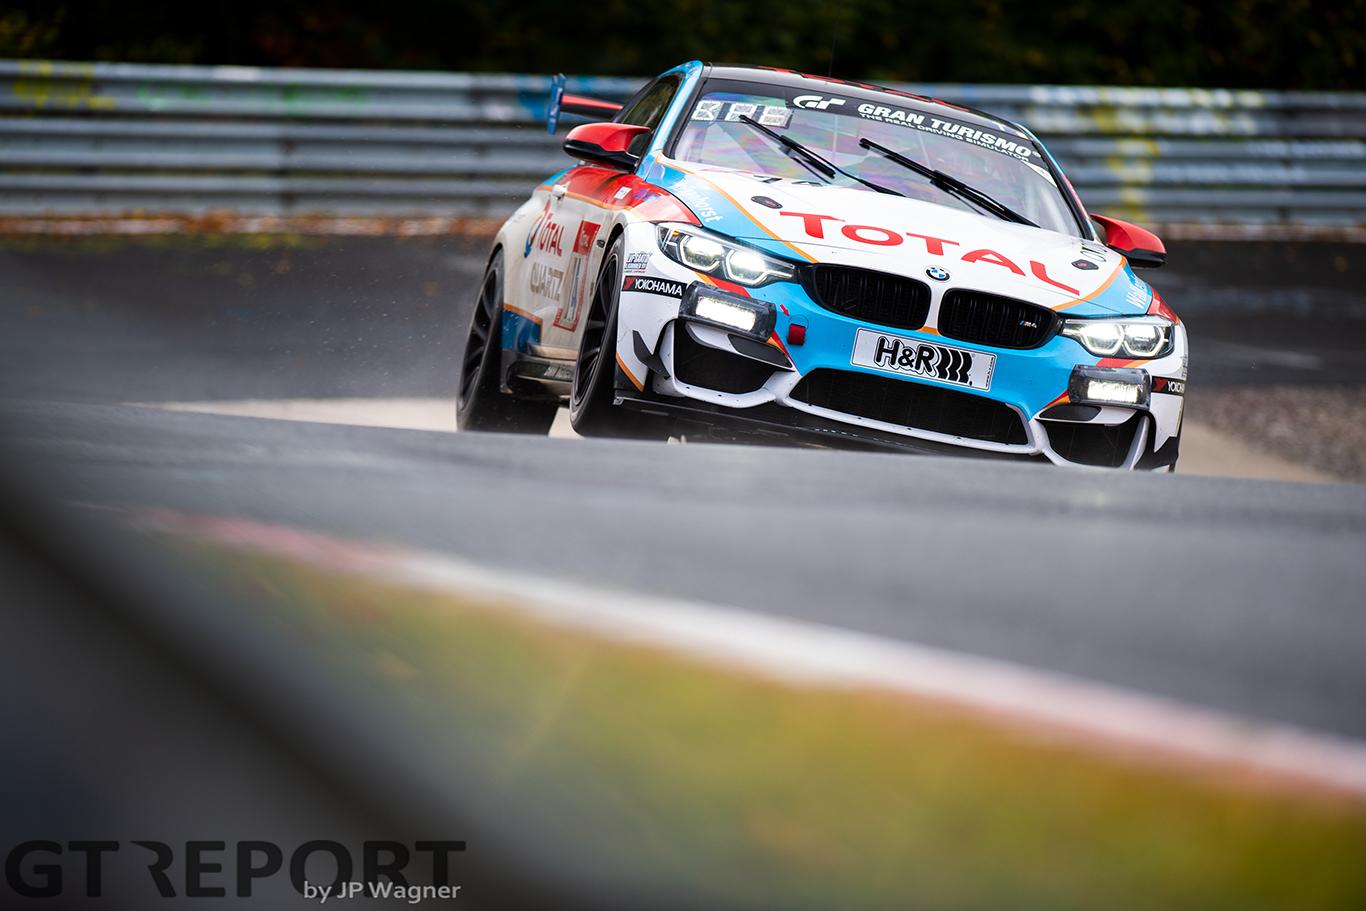 Nürburgring 24 Hours driver report: Ben Tuck – Race finish